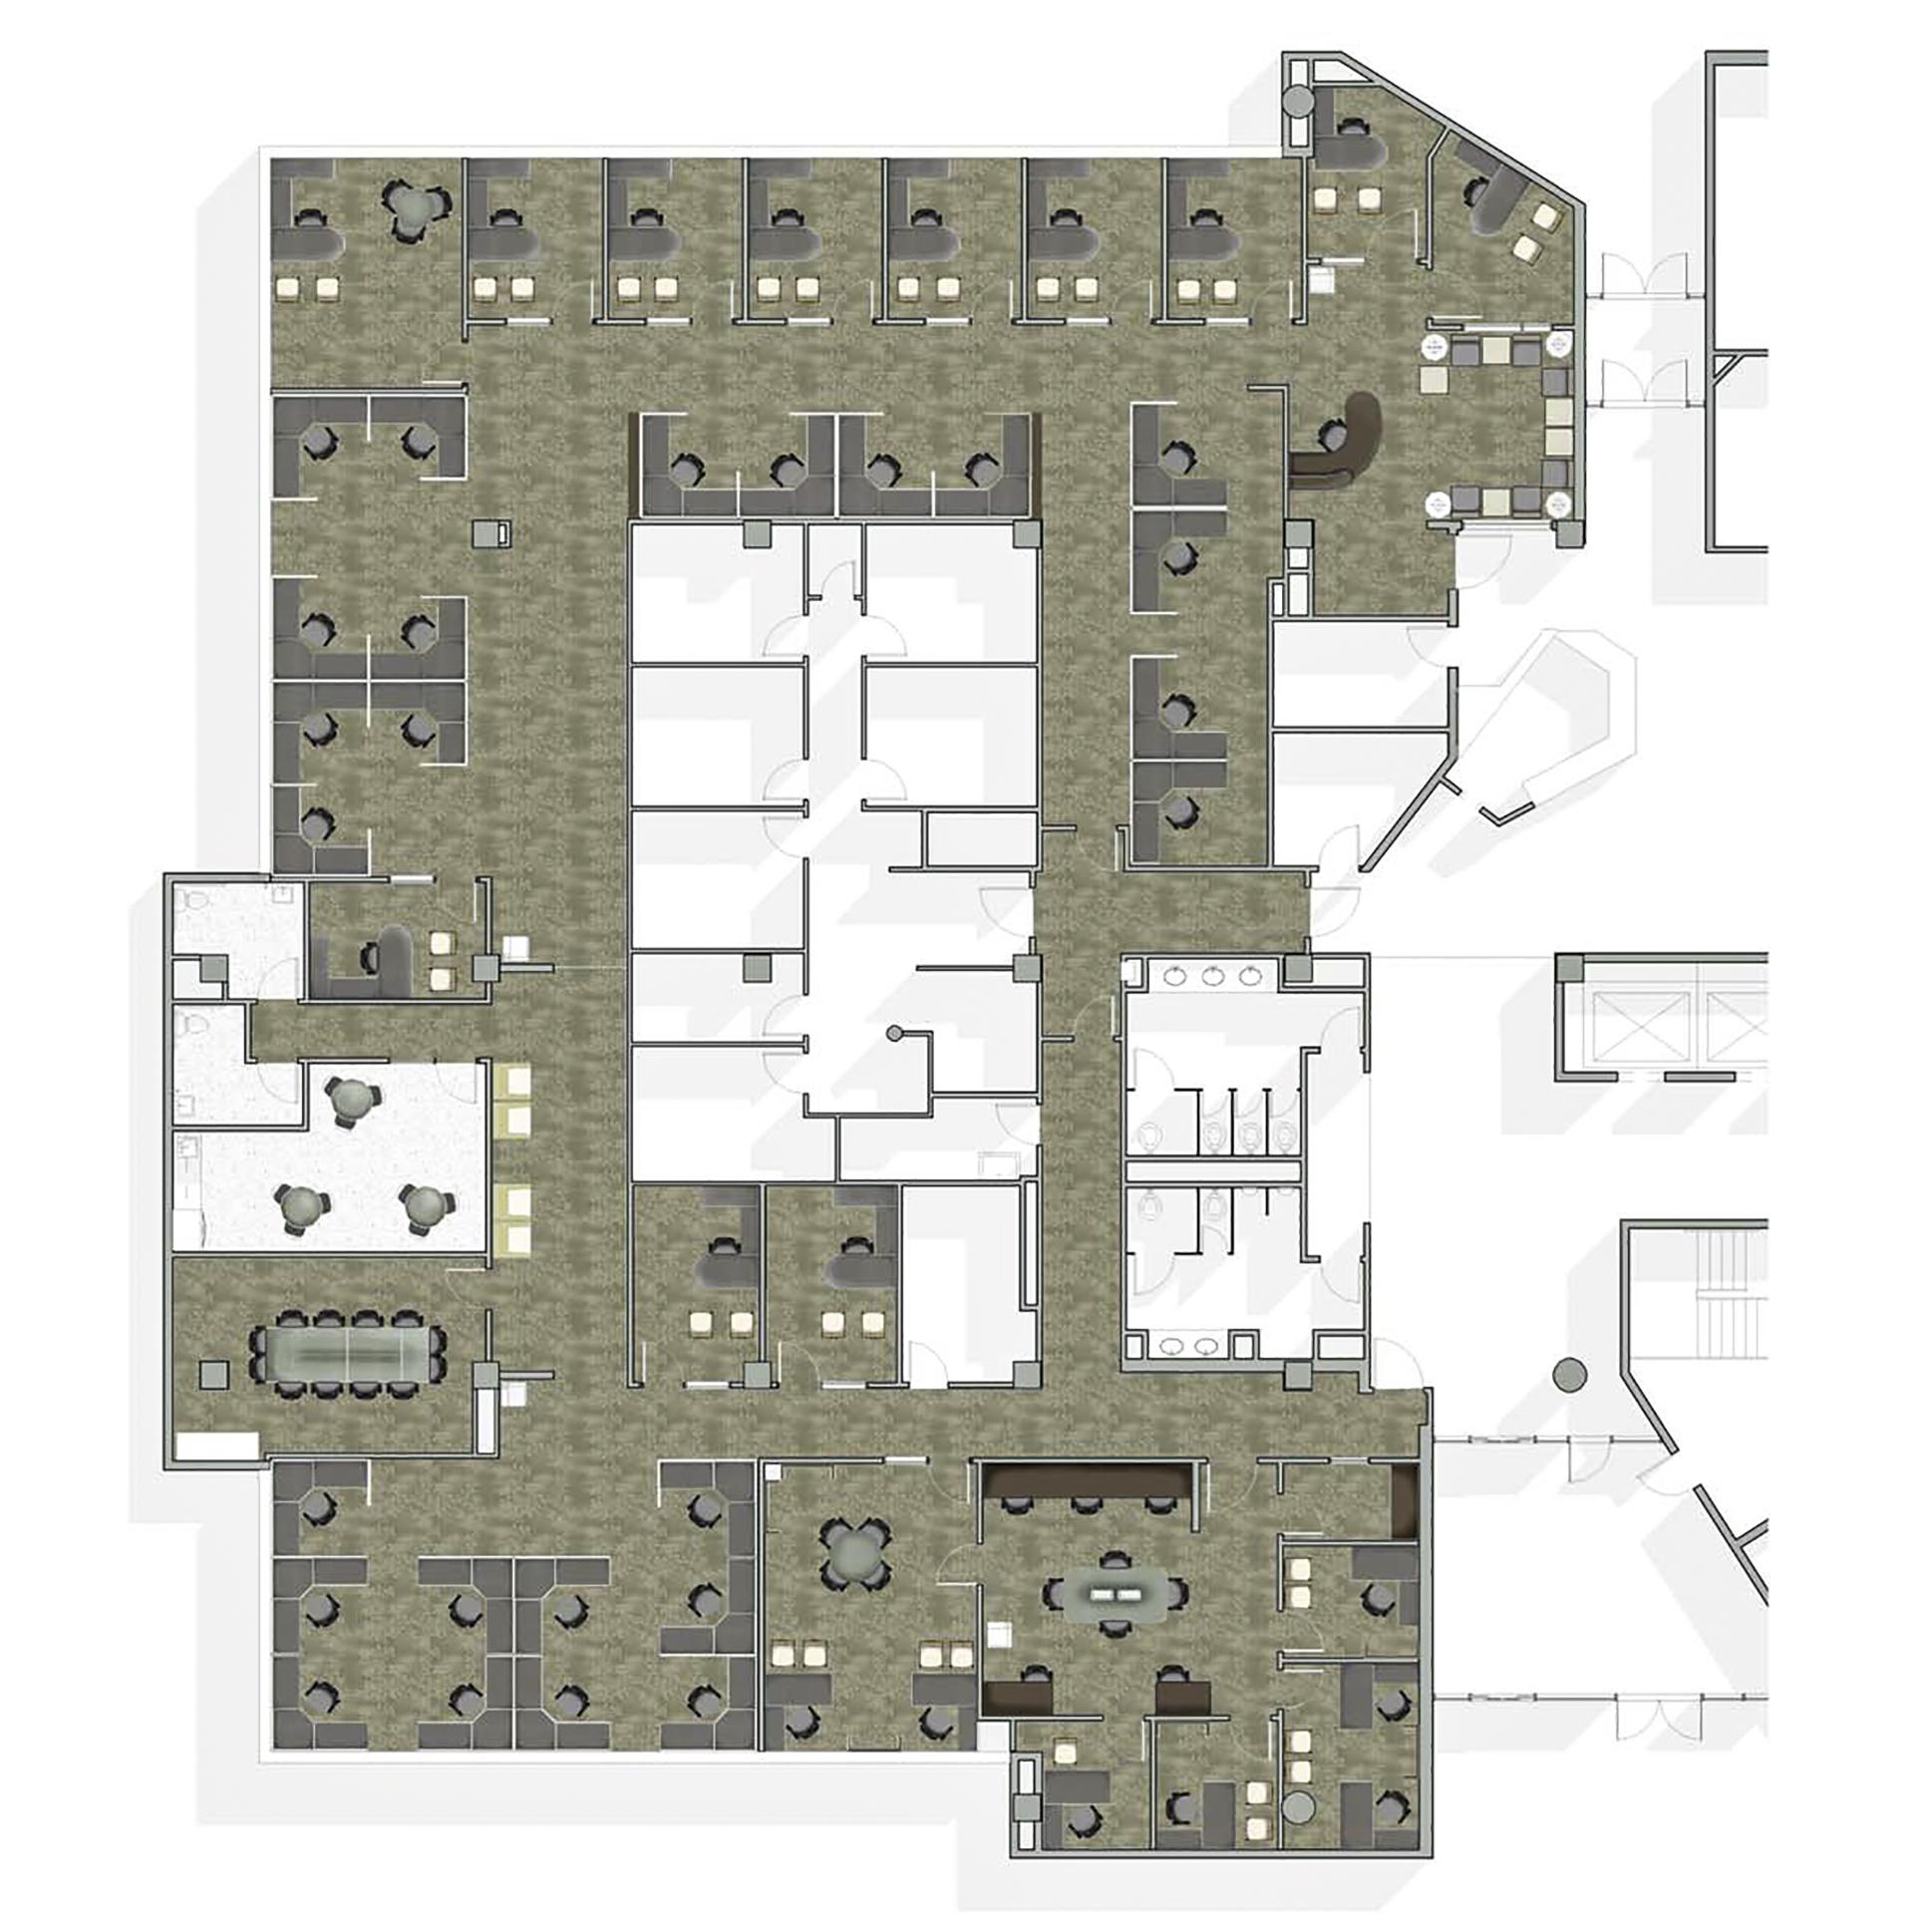 12-10.08 – (LIGHTER) Rendered Floor Plan Scheme B.psd